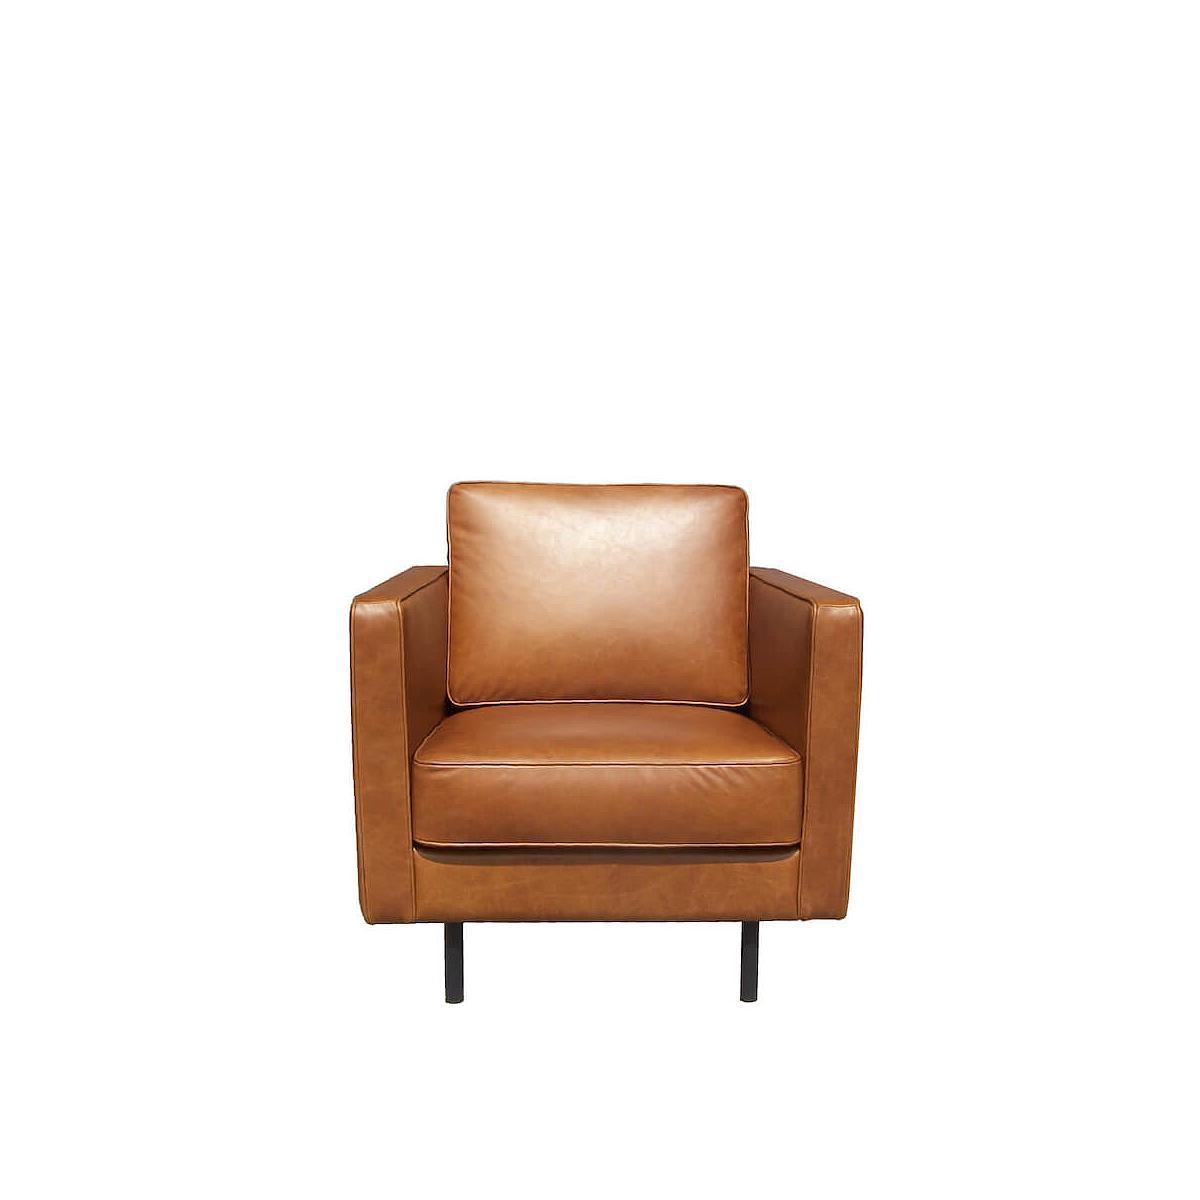 Fauteuil N501 Ethnicraft brun